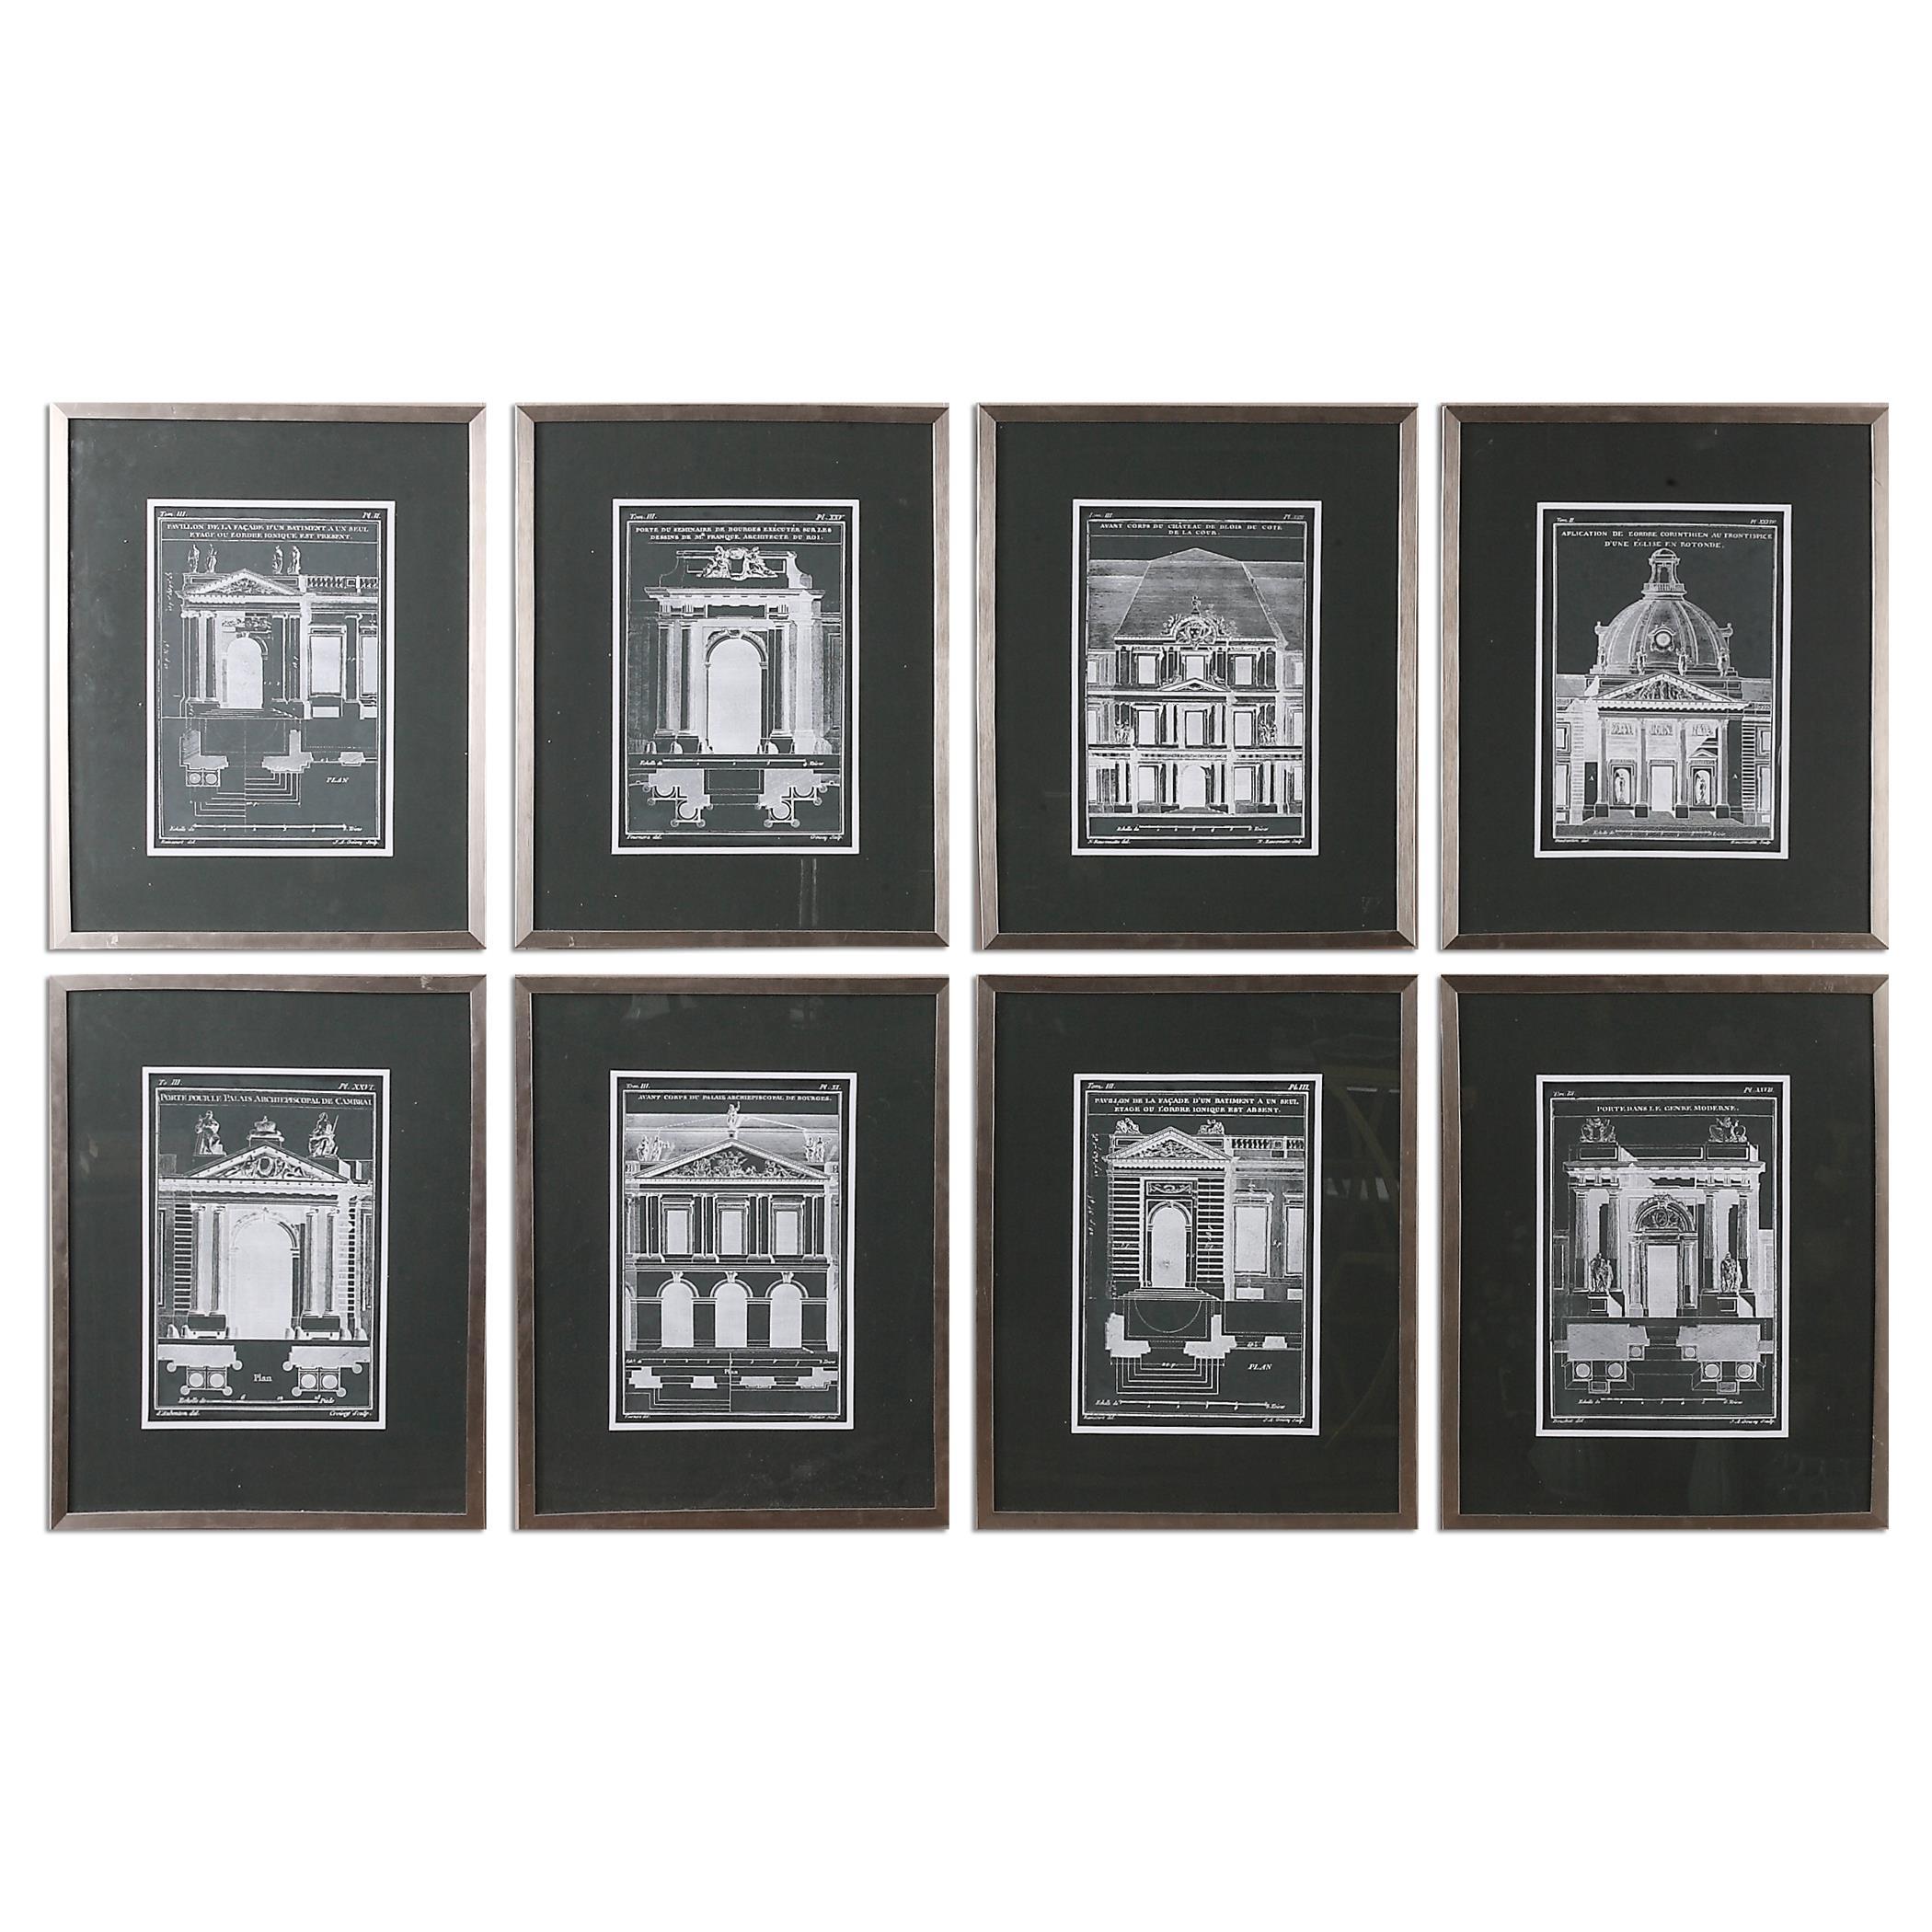 Uttermost Art Architecturals Vintage Art, S/8 - Item Number: 33610